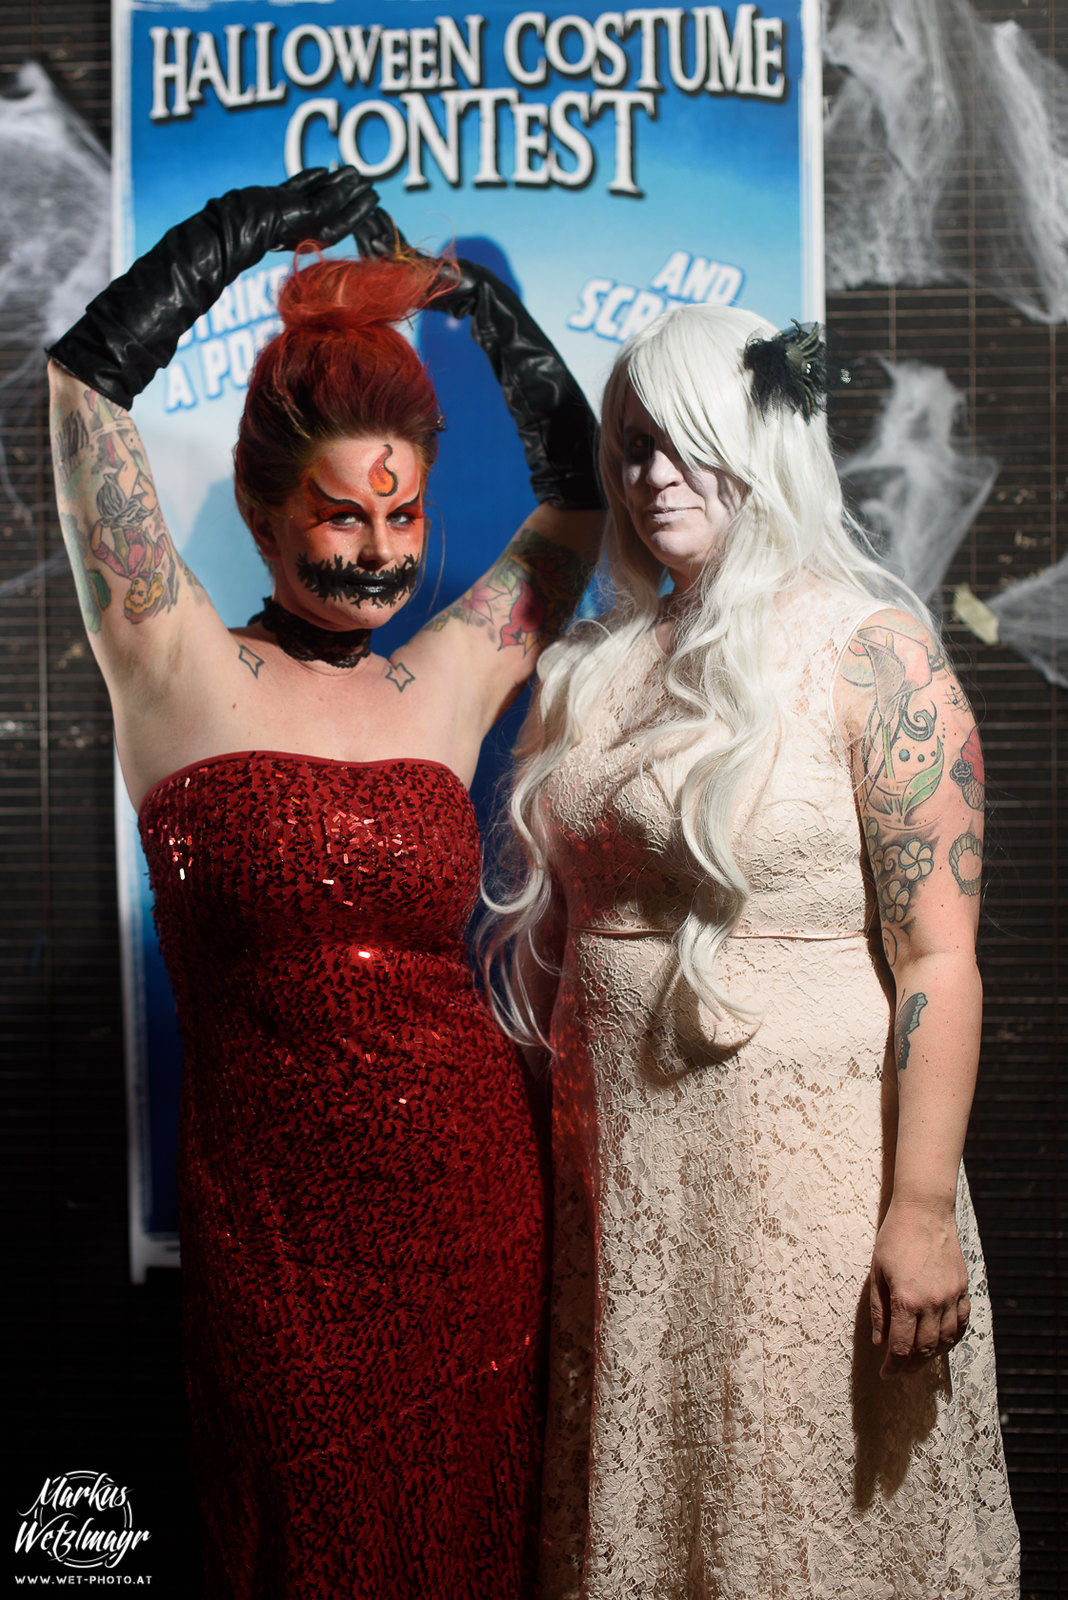 "#16 - Bianca & Tanja Reindl, ""Höllenfeuer & Geist"" - Everyday is Halloween, 15 Years of BZFOS"